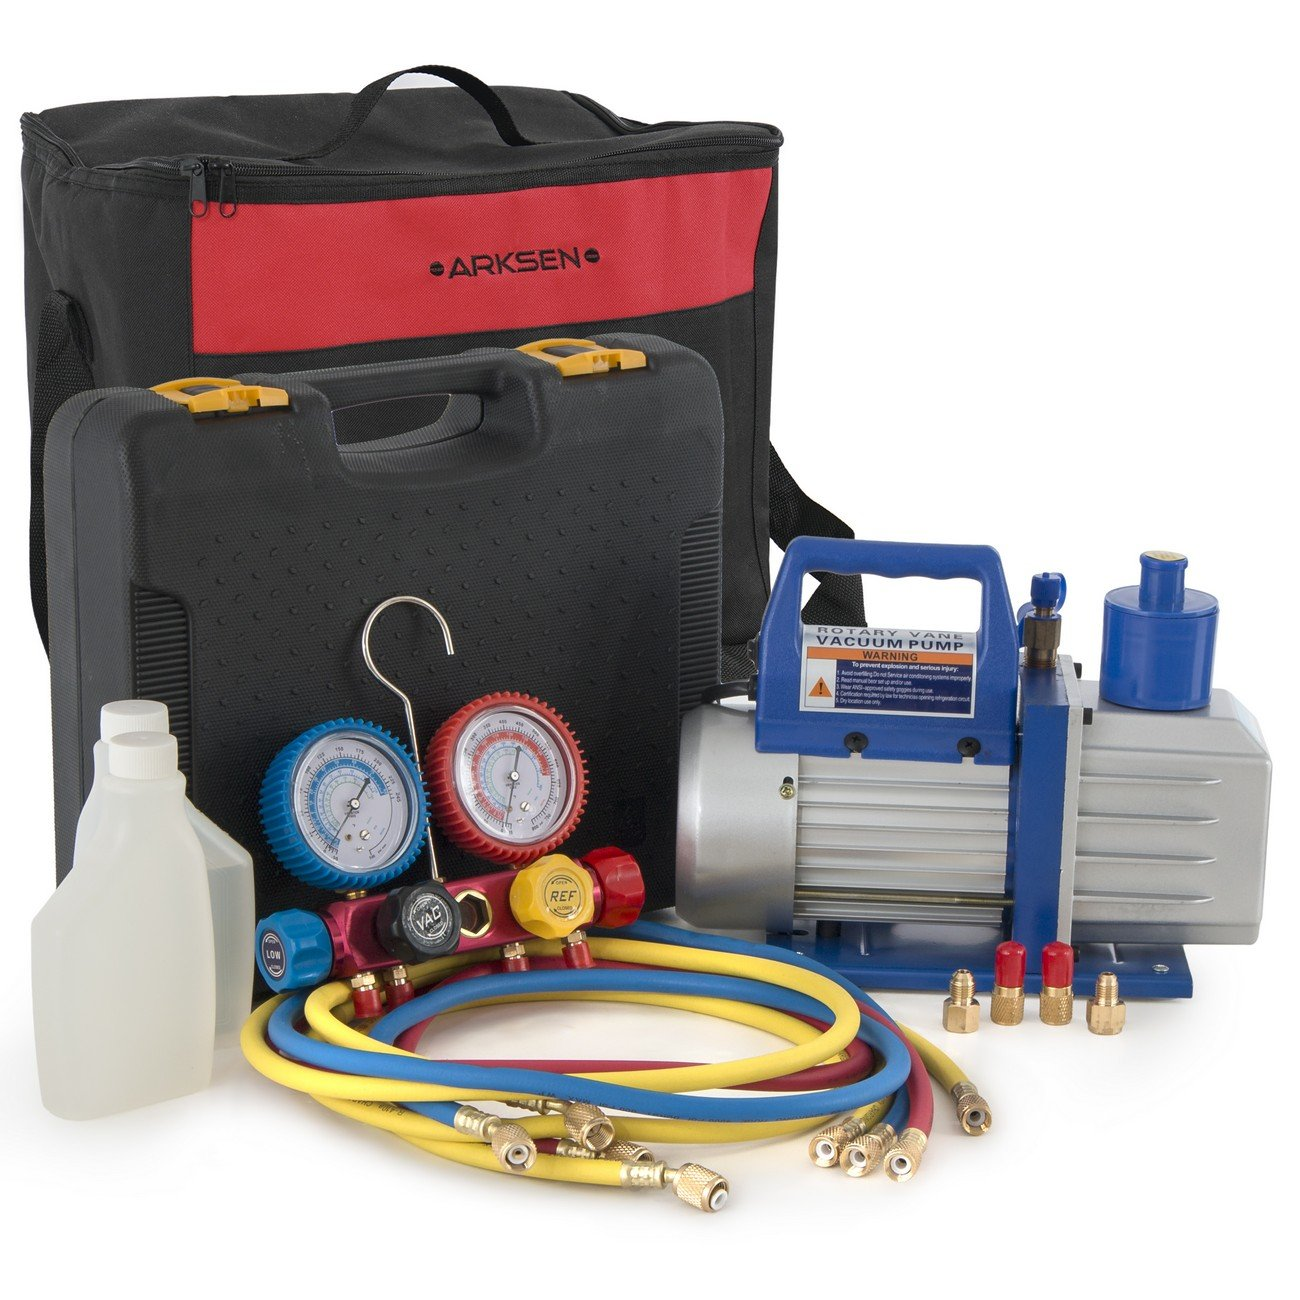 ARKSEN 5CFM Vacuum Pump Manifold Gauge R404A R410A R22 Refrigerant w/ Carrying Tote Bag Set